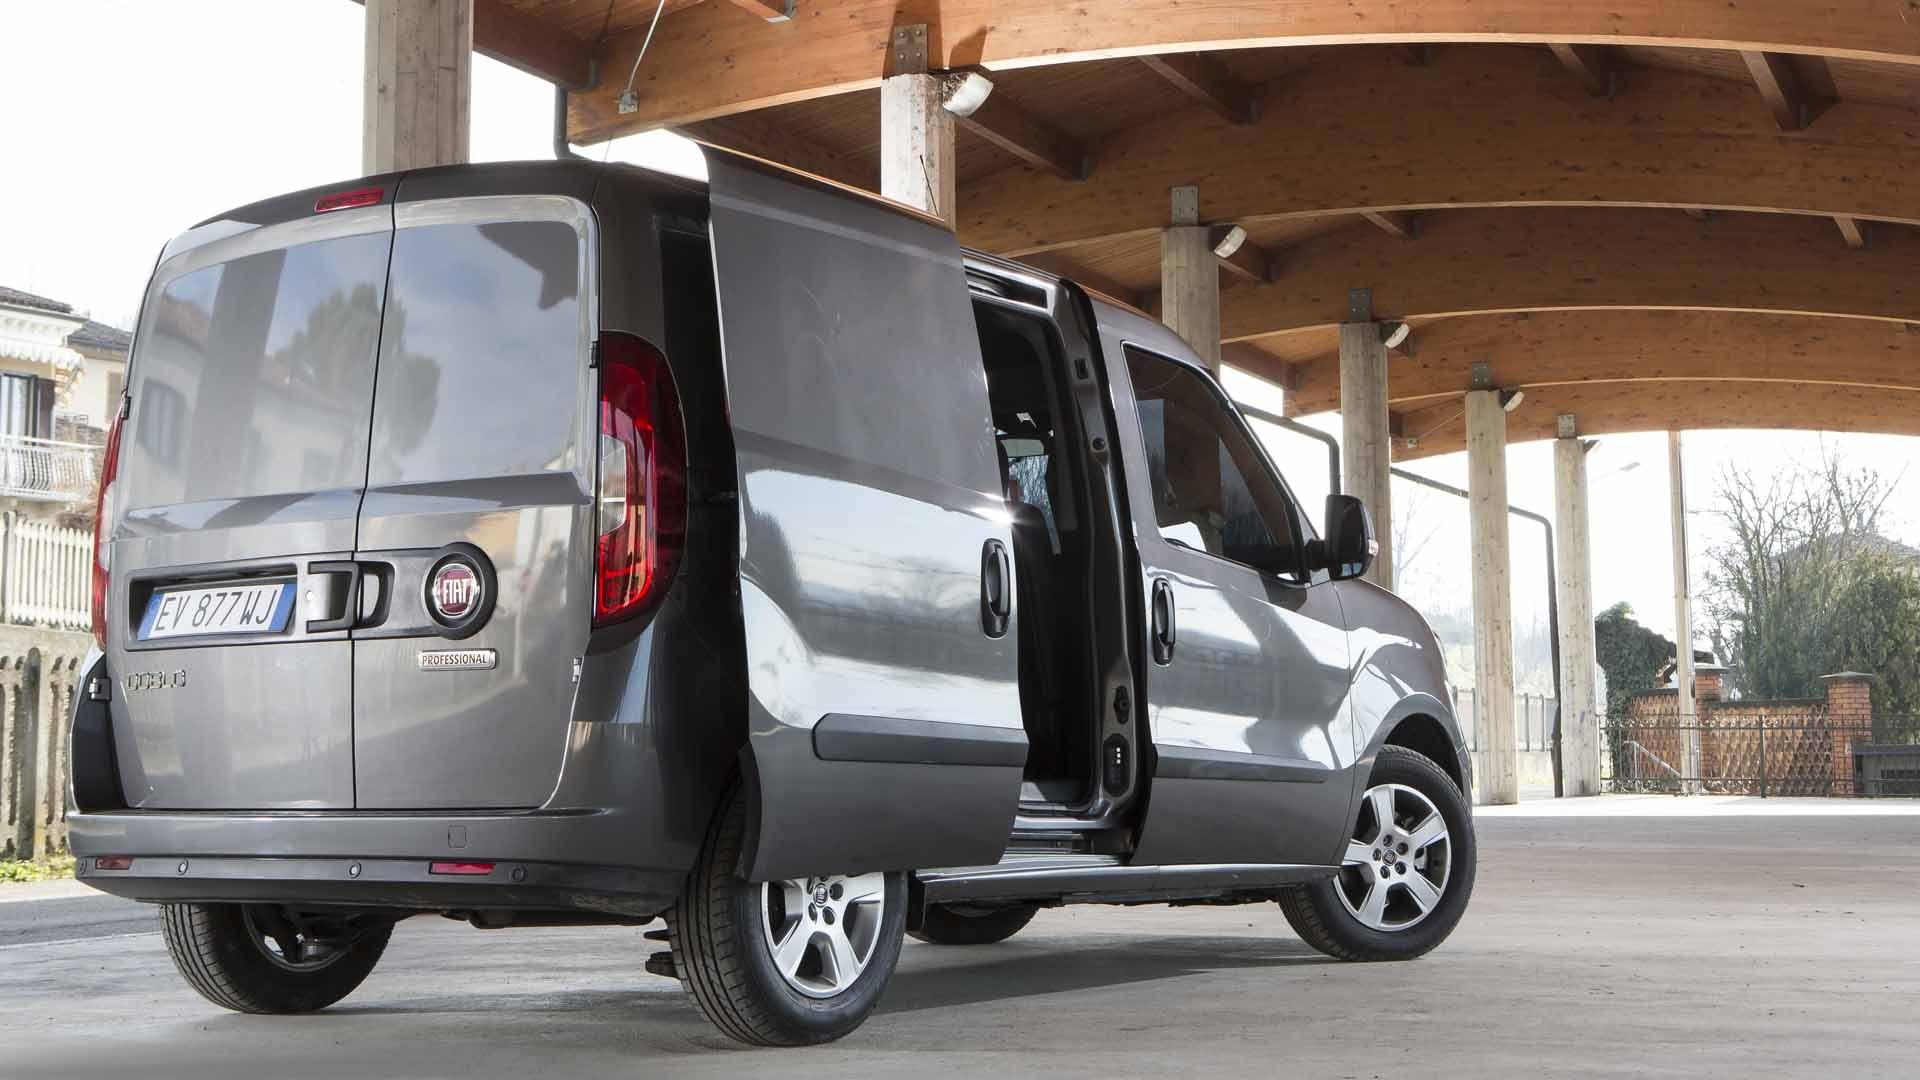 Fiat Doblo side grå